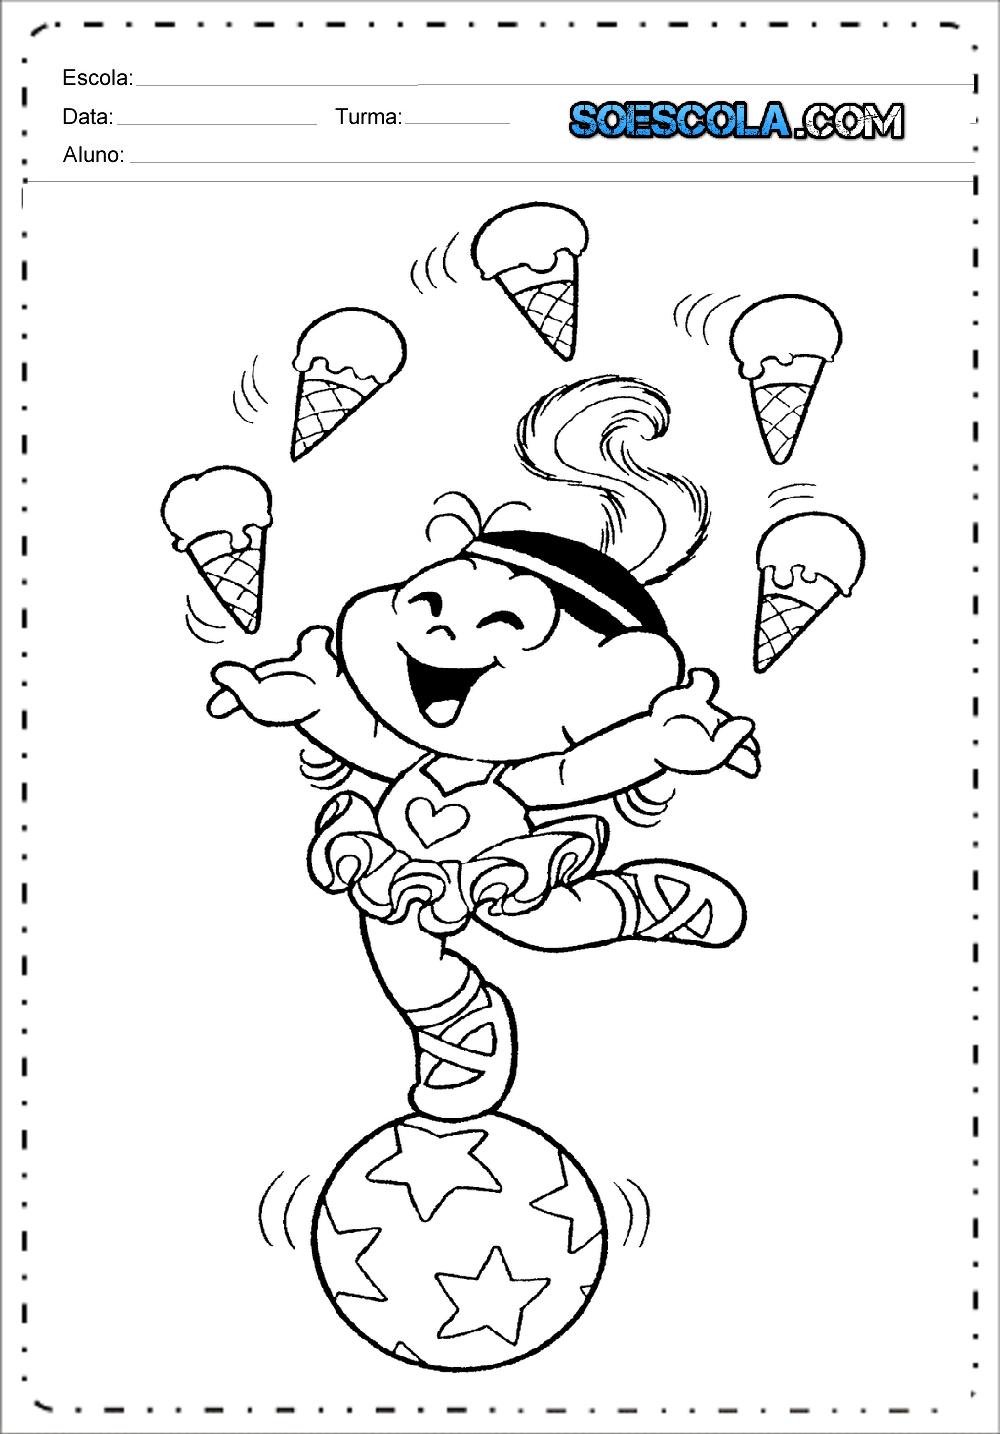 Desenhos De Circo Da Turma Da Monica Para Colorir So Escola